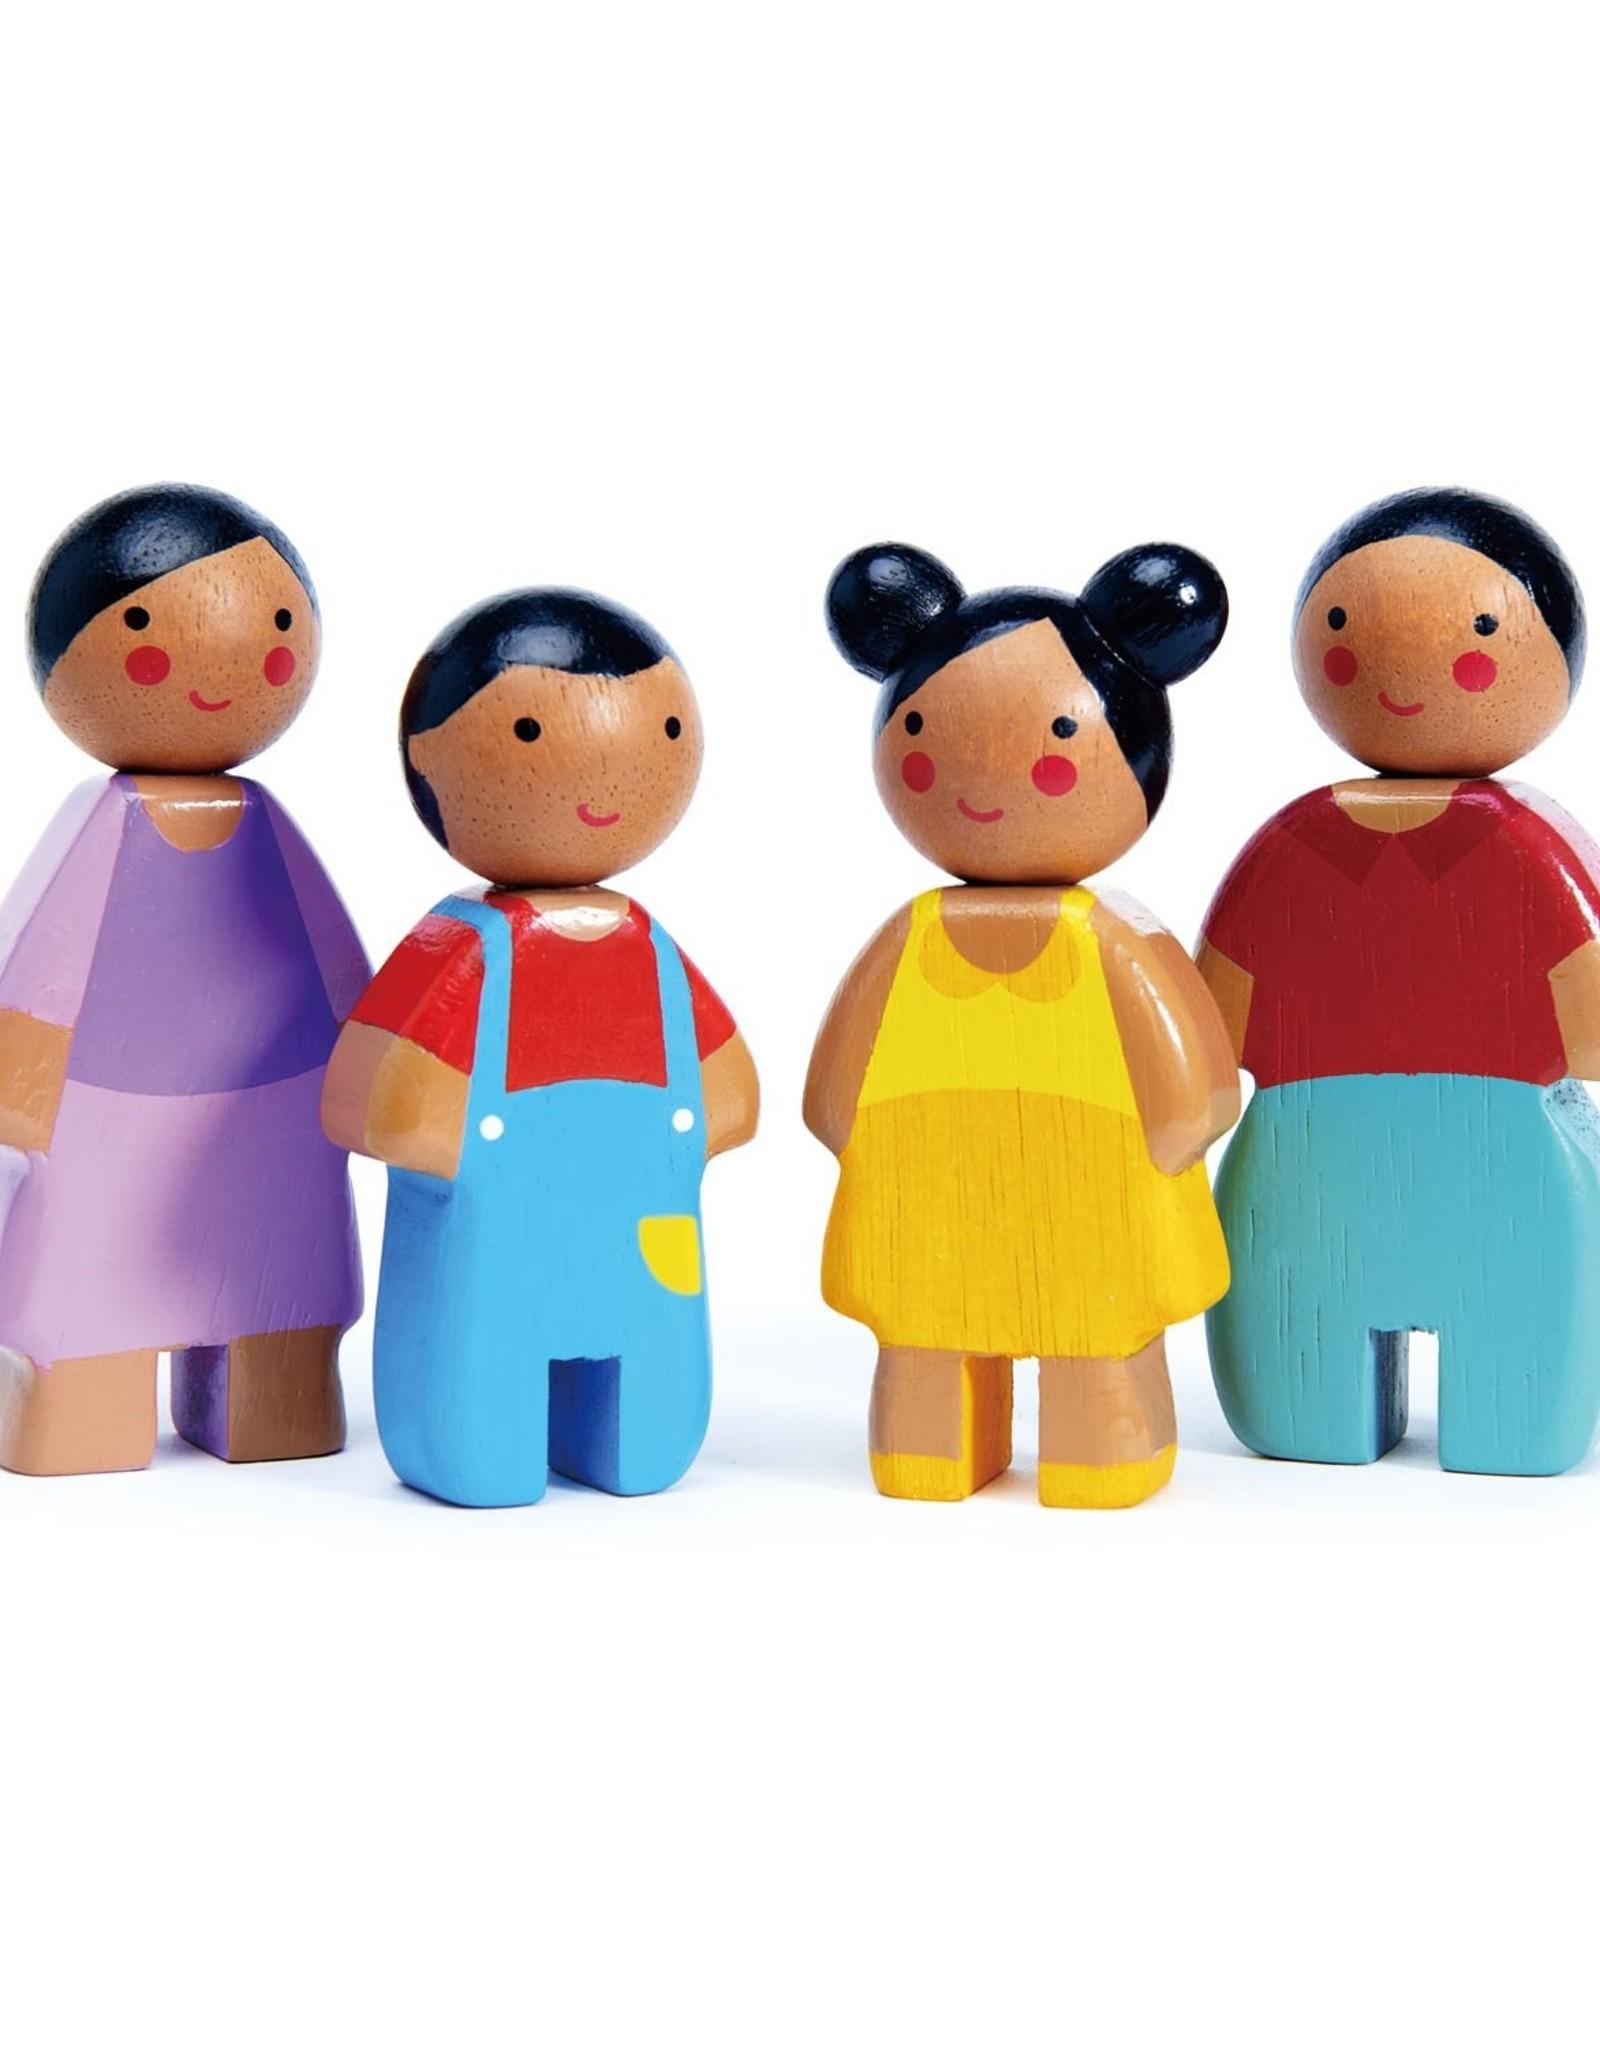 Tender leaf toys Sunny Doll Family